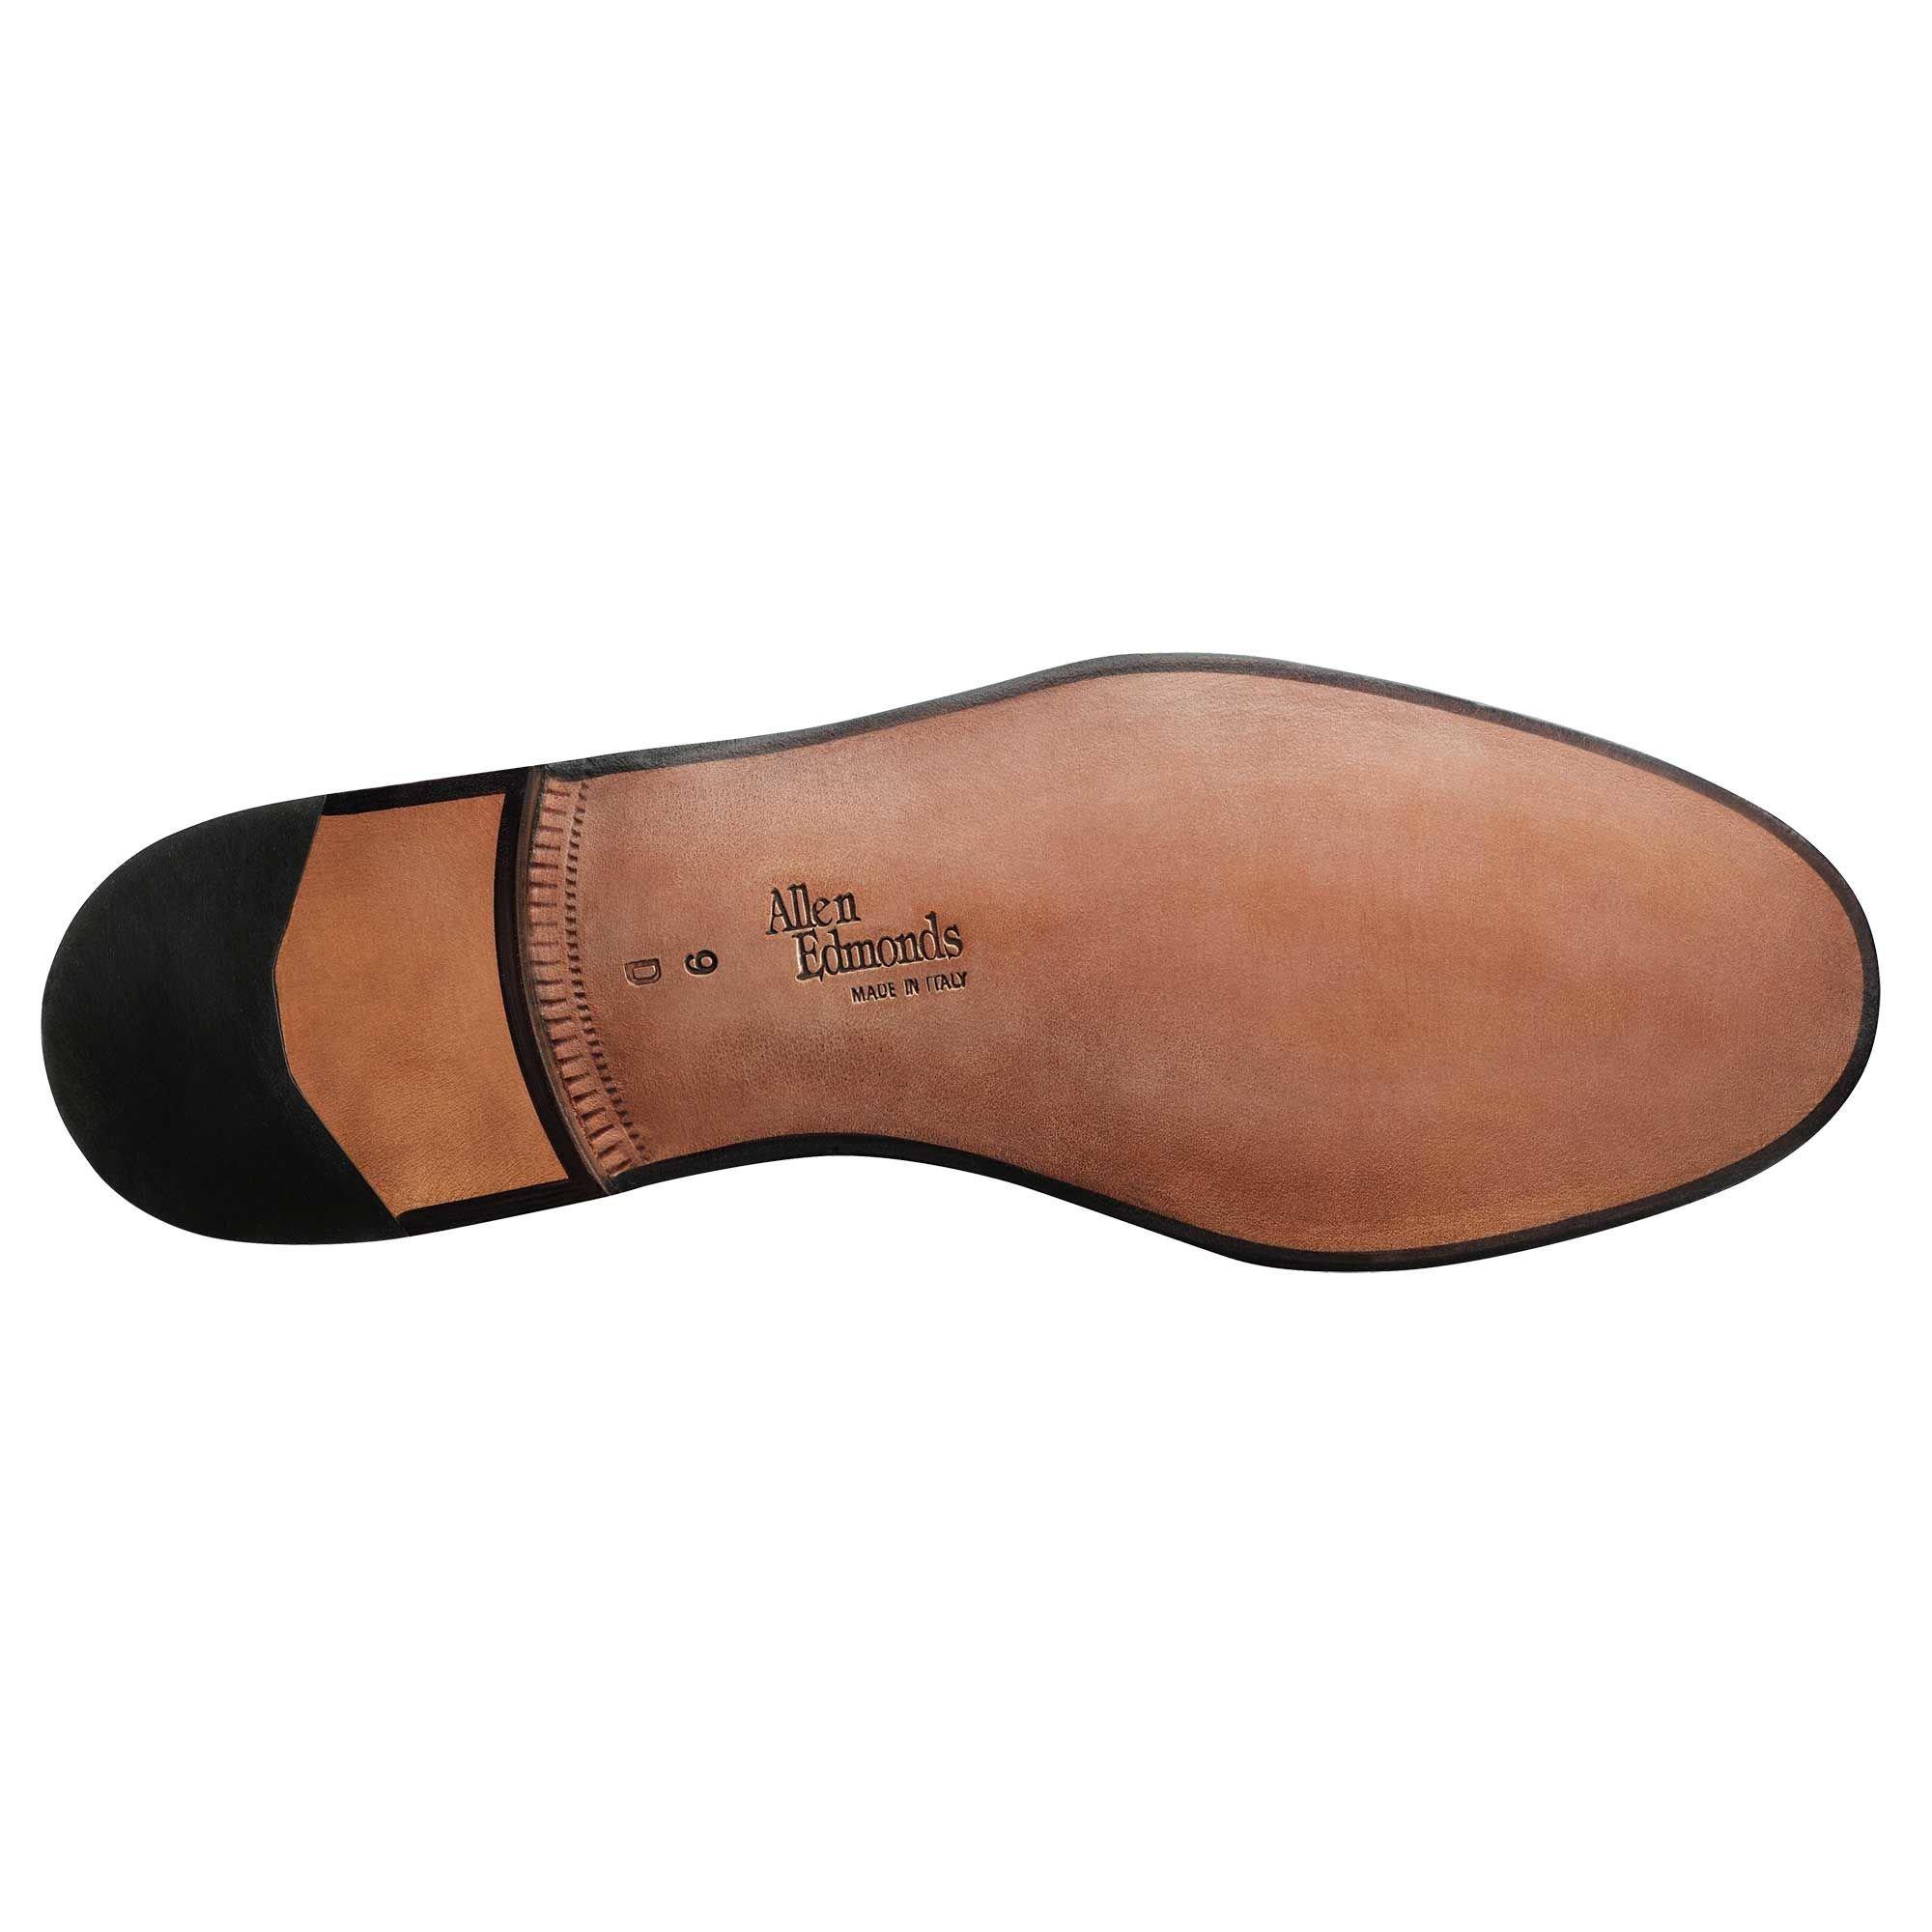 Allen Edmonds Men's Urbino Tassel Loafer,Black,11.5 D